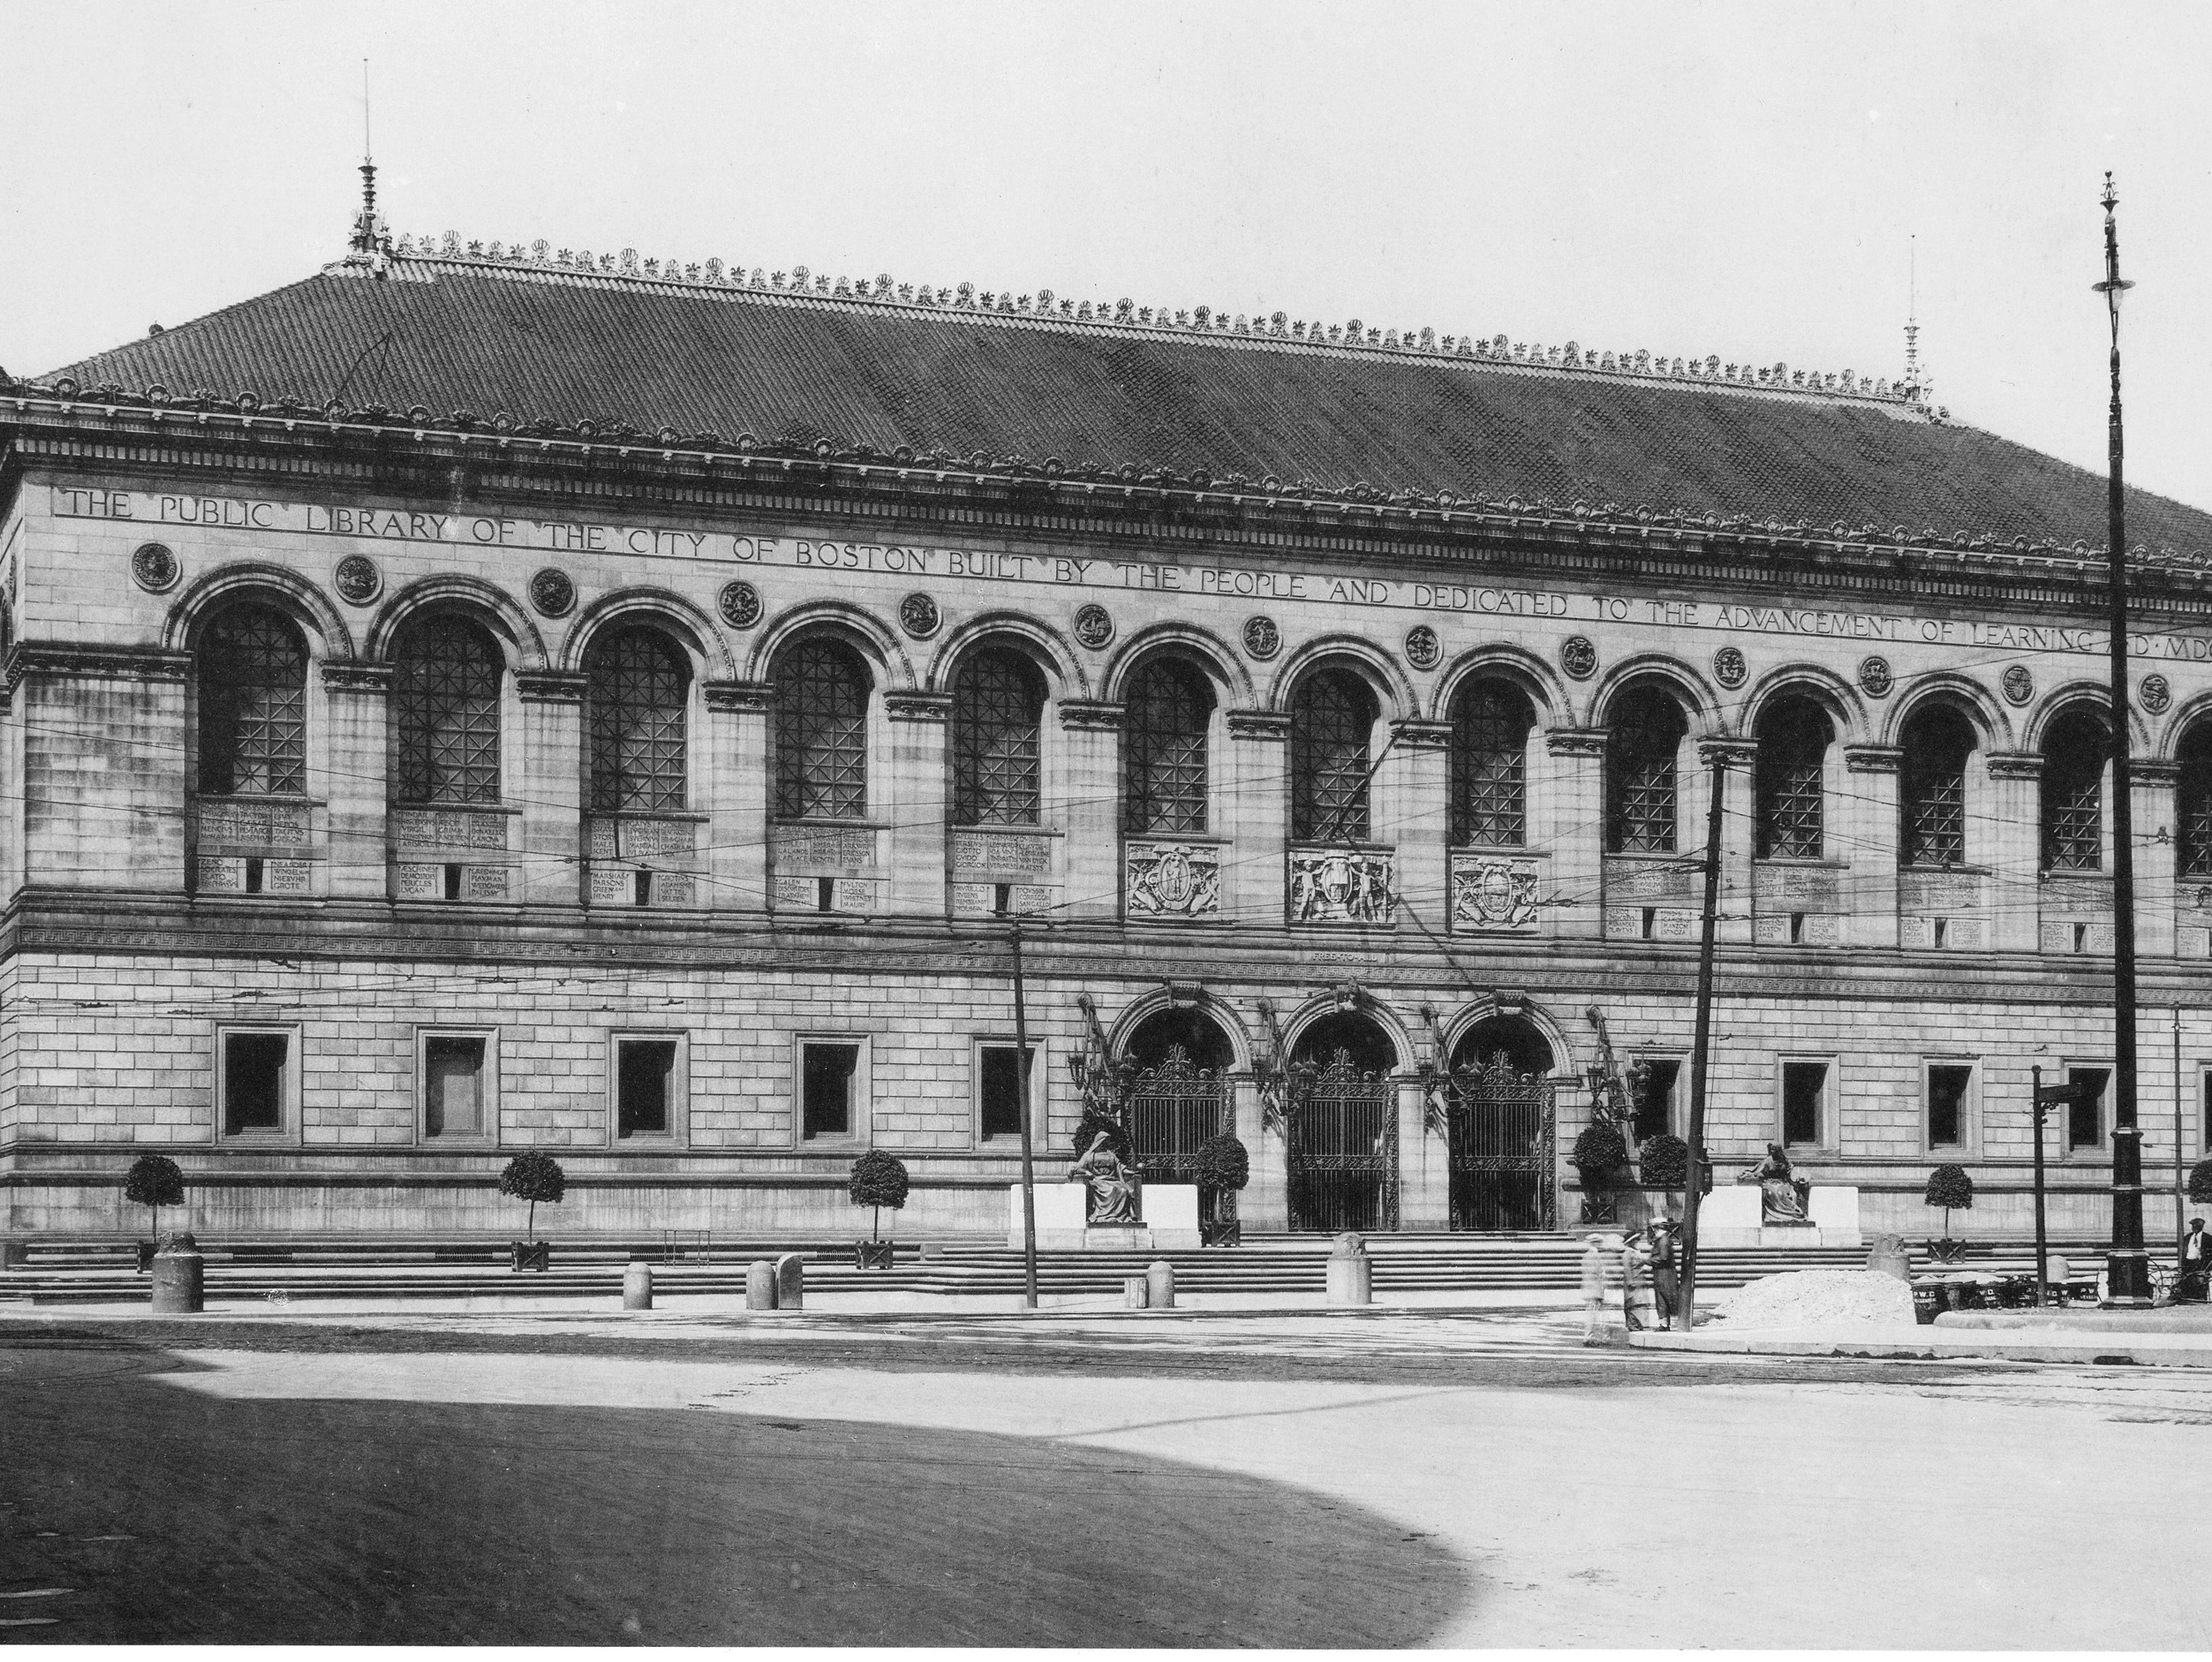 McKim, Mead & White, Boston Library